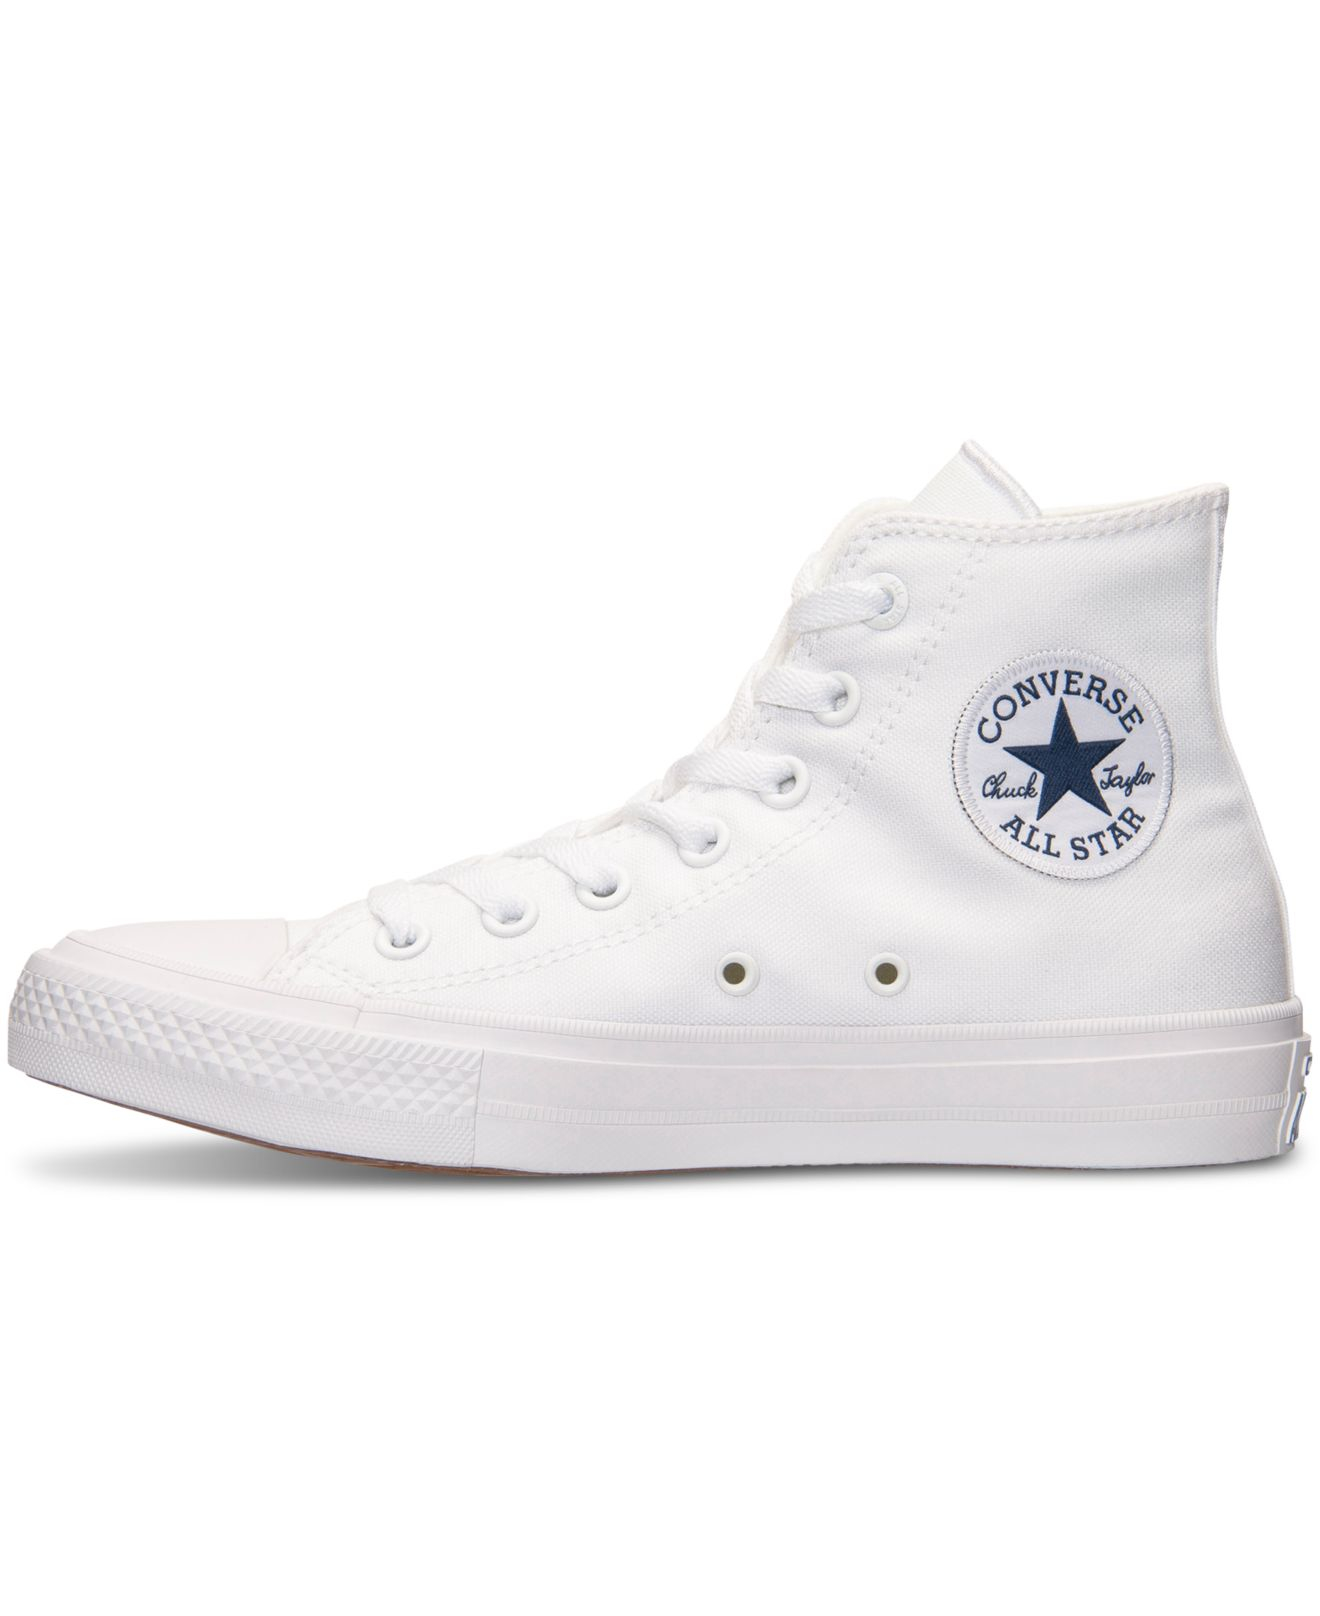 da60831f9f35d0 Lyst - Converse Women s Chuck Taylor All Star Ii Hi Casual Sneakers ...